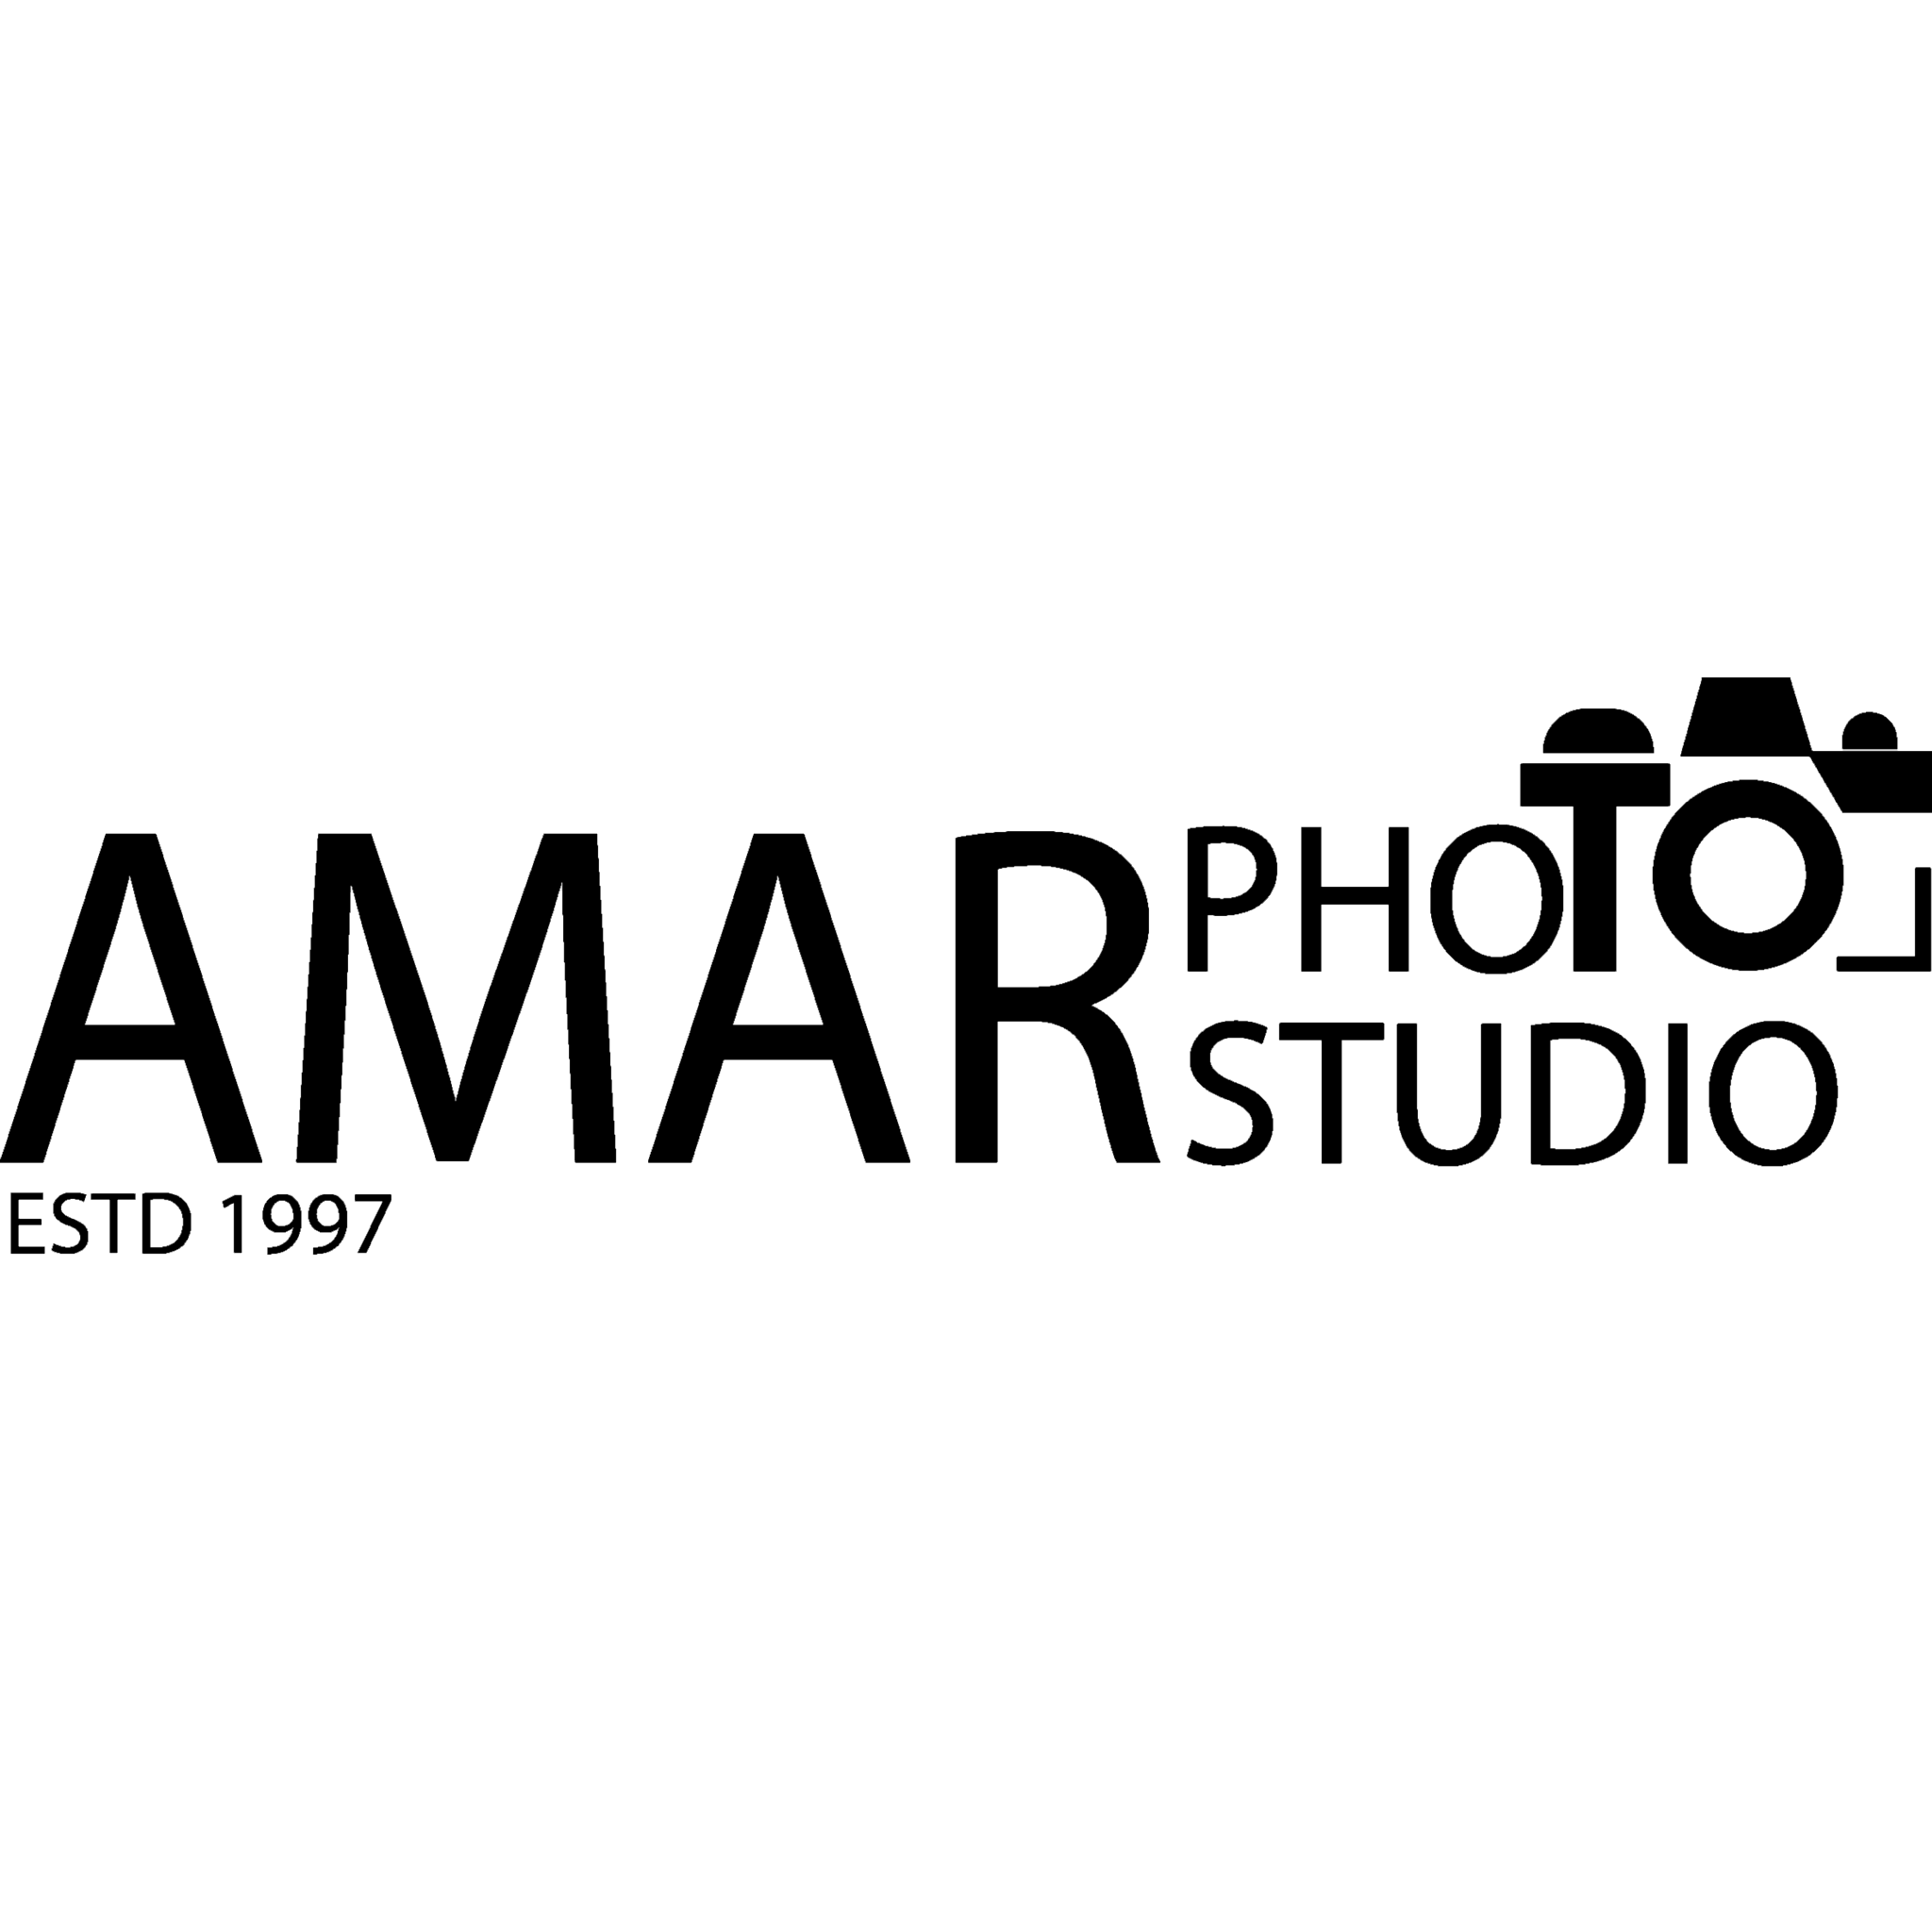 Amar Photo Studio